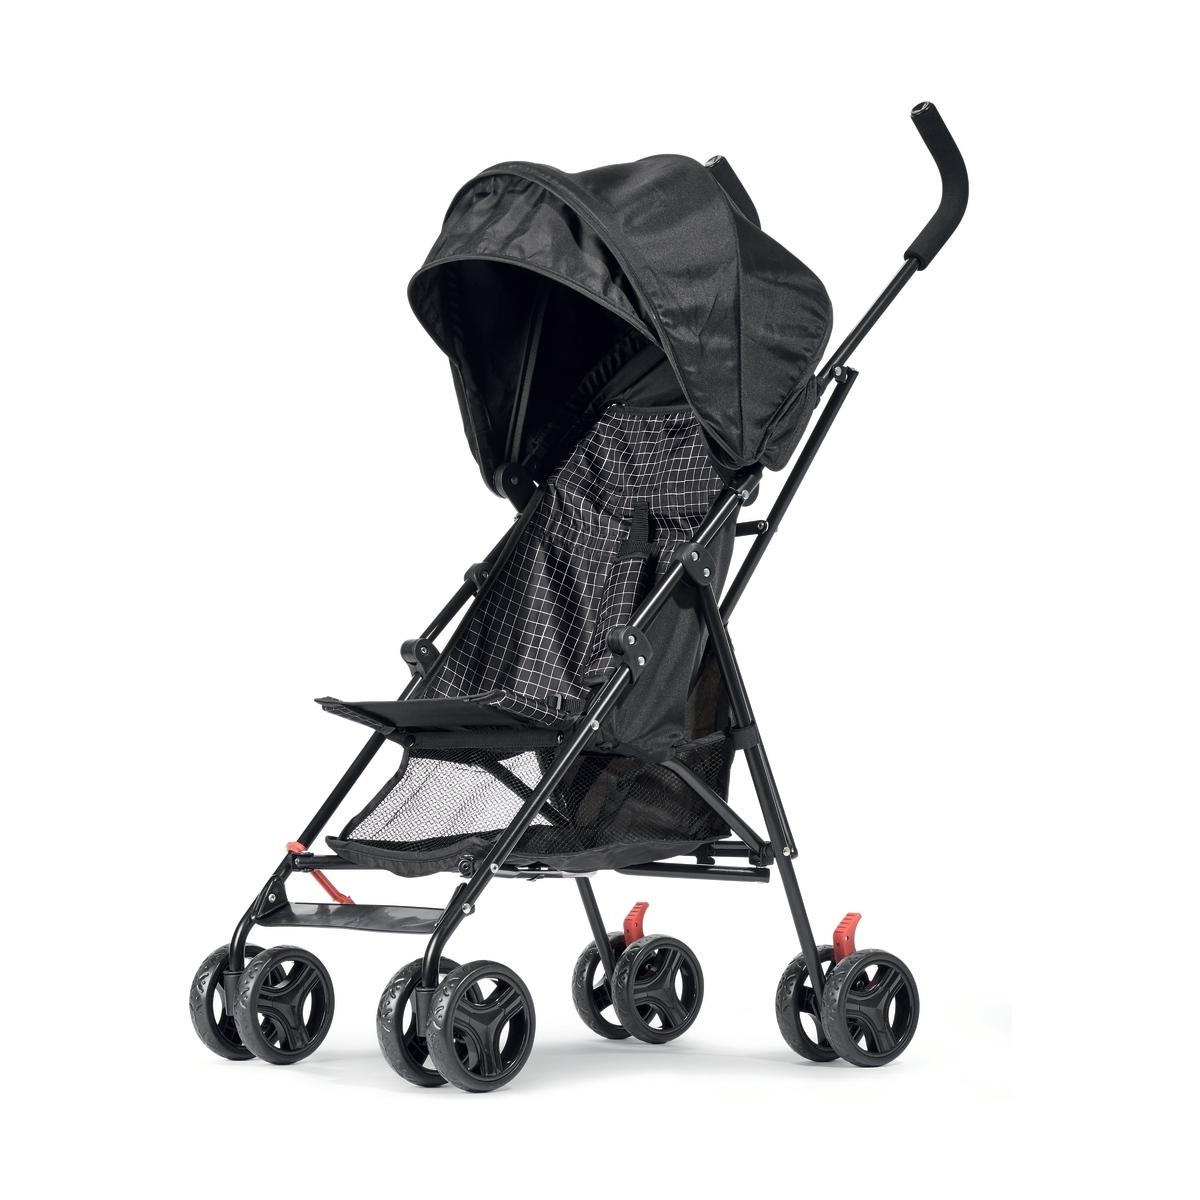 Upright Umbrella Stroller Kmart